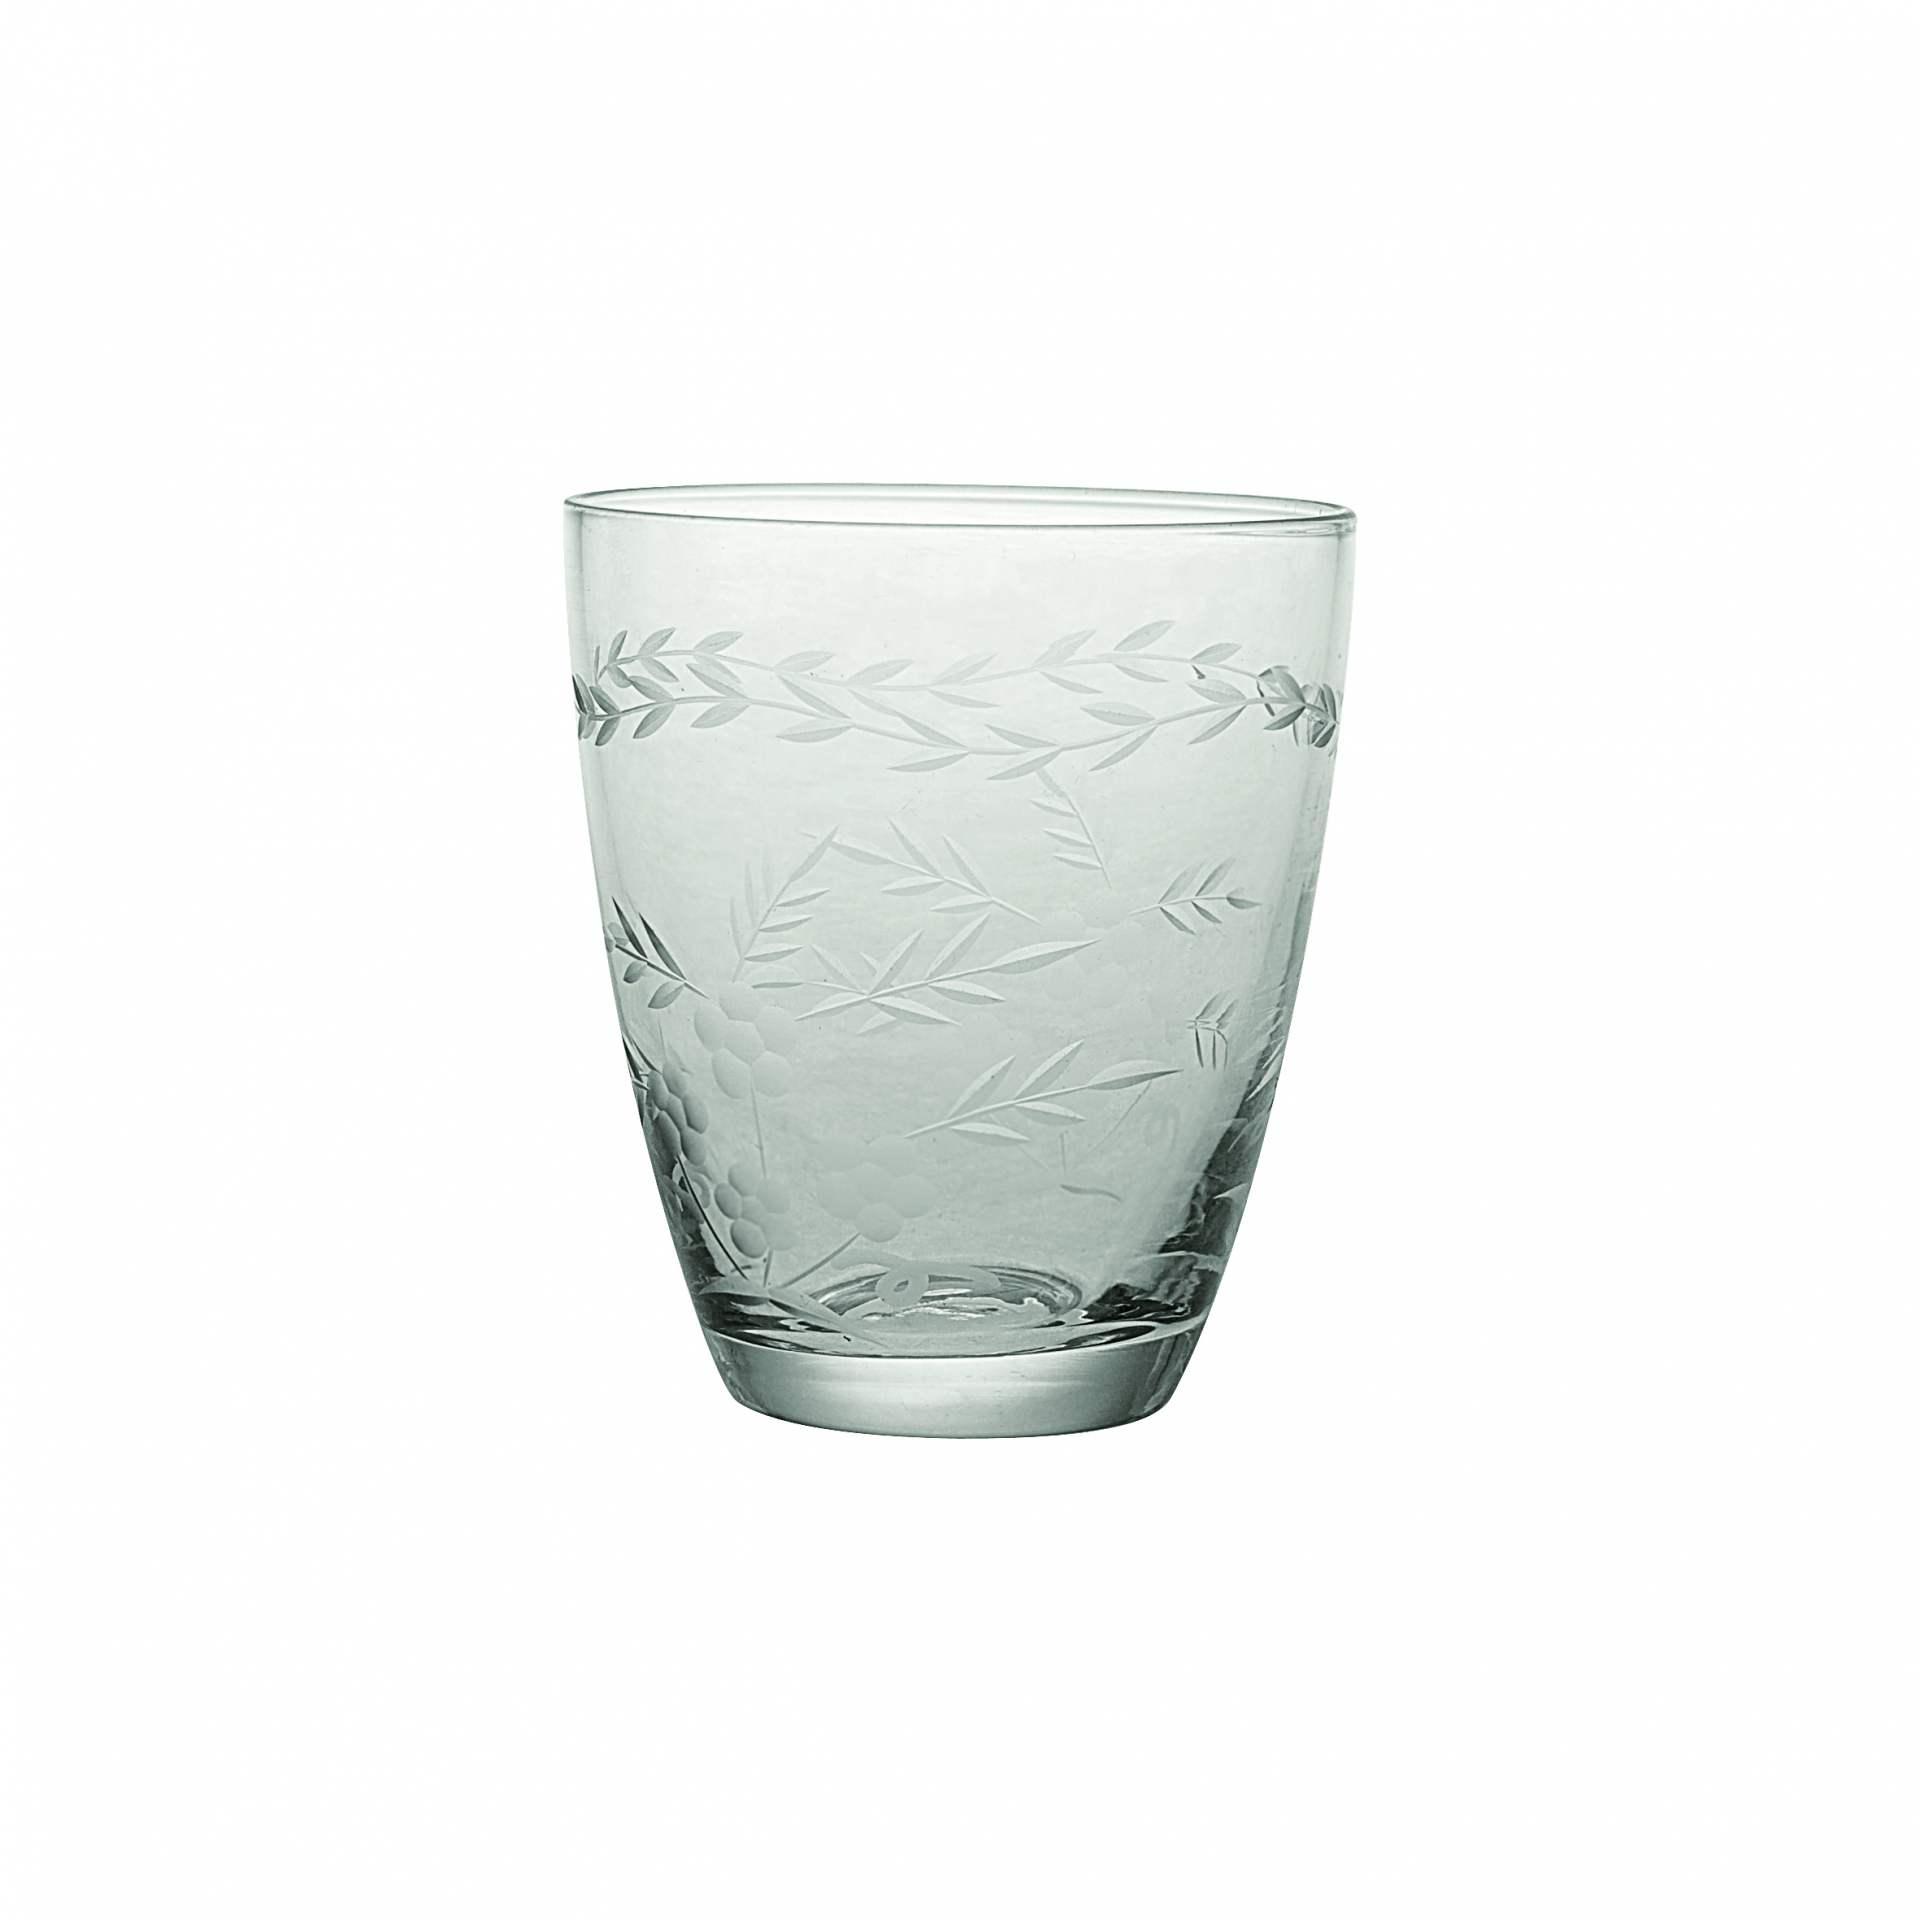 GREEN GATE Broušená sklenička Clear, čirá barva, sklo